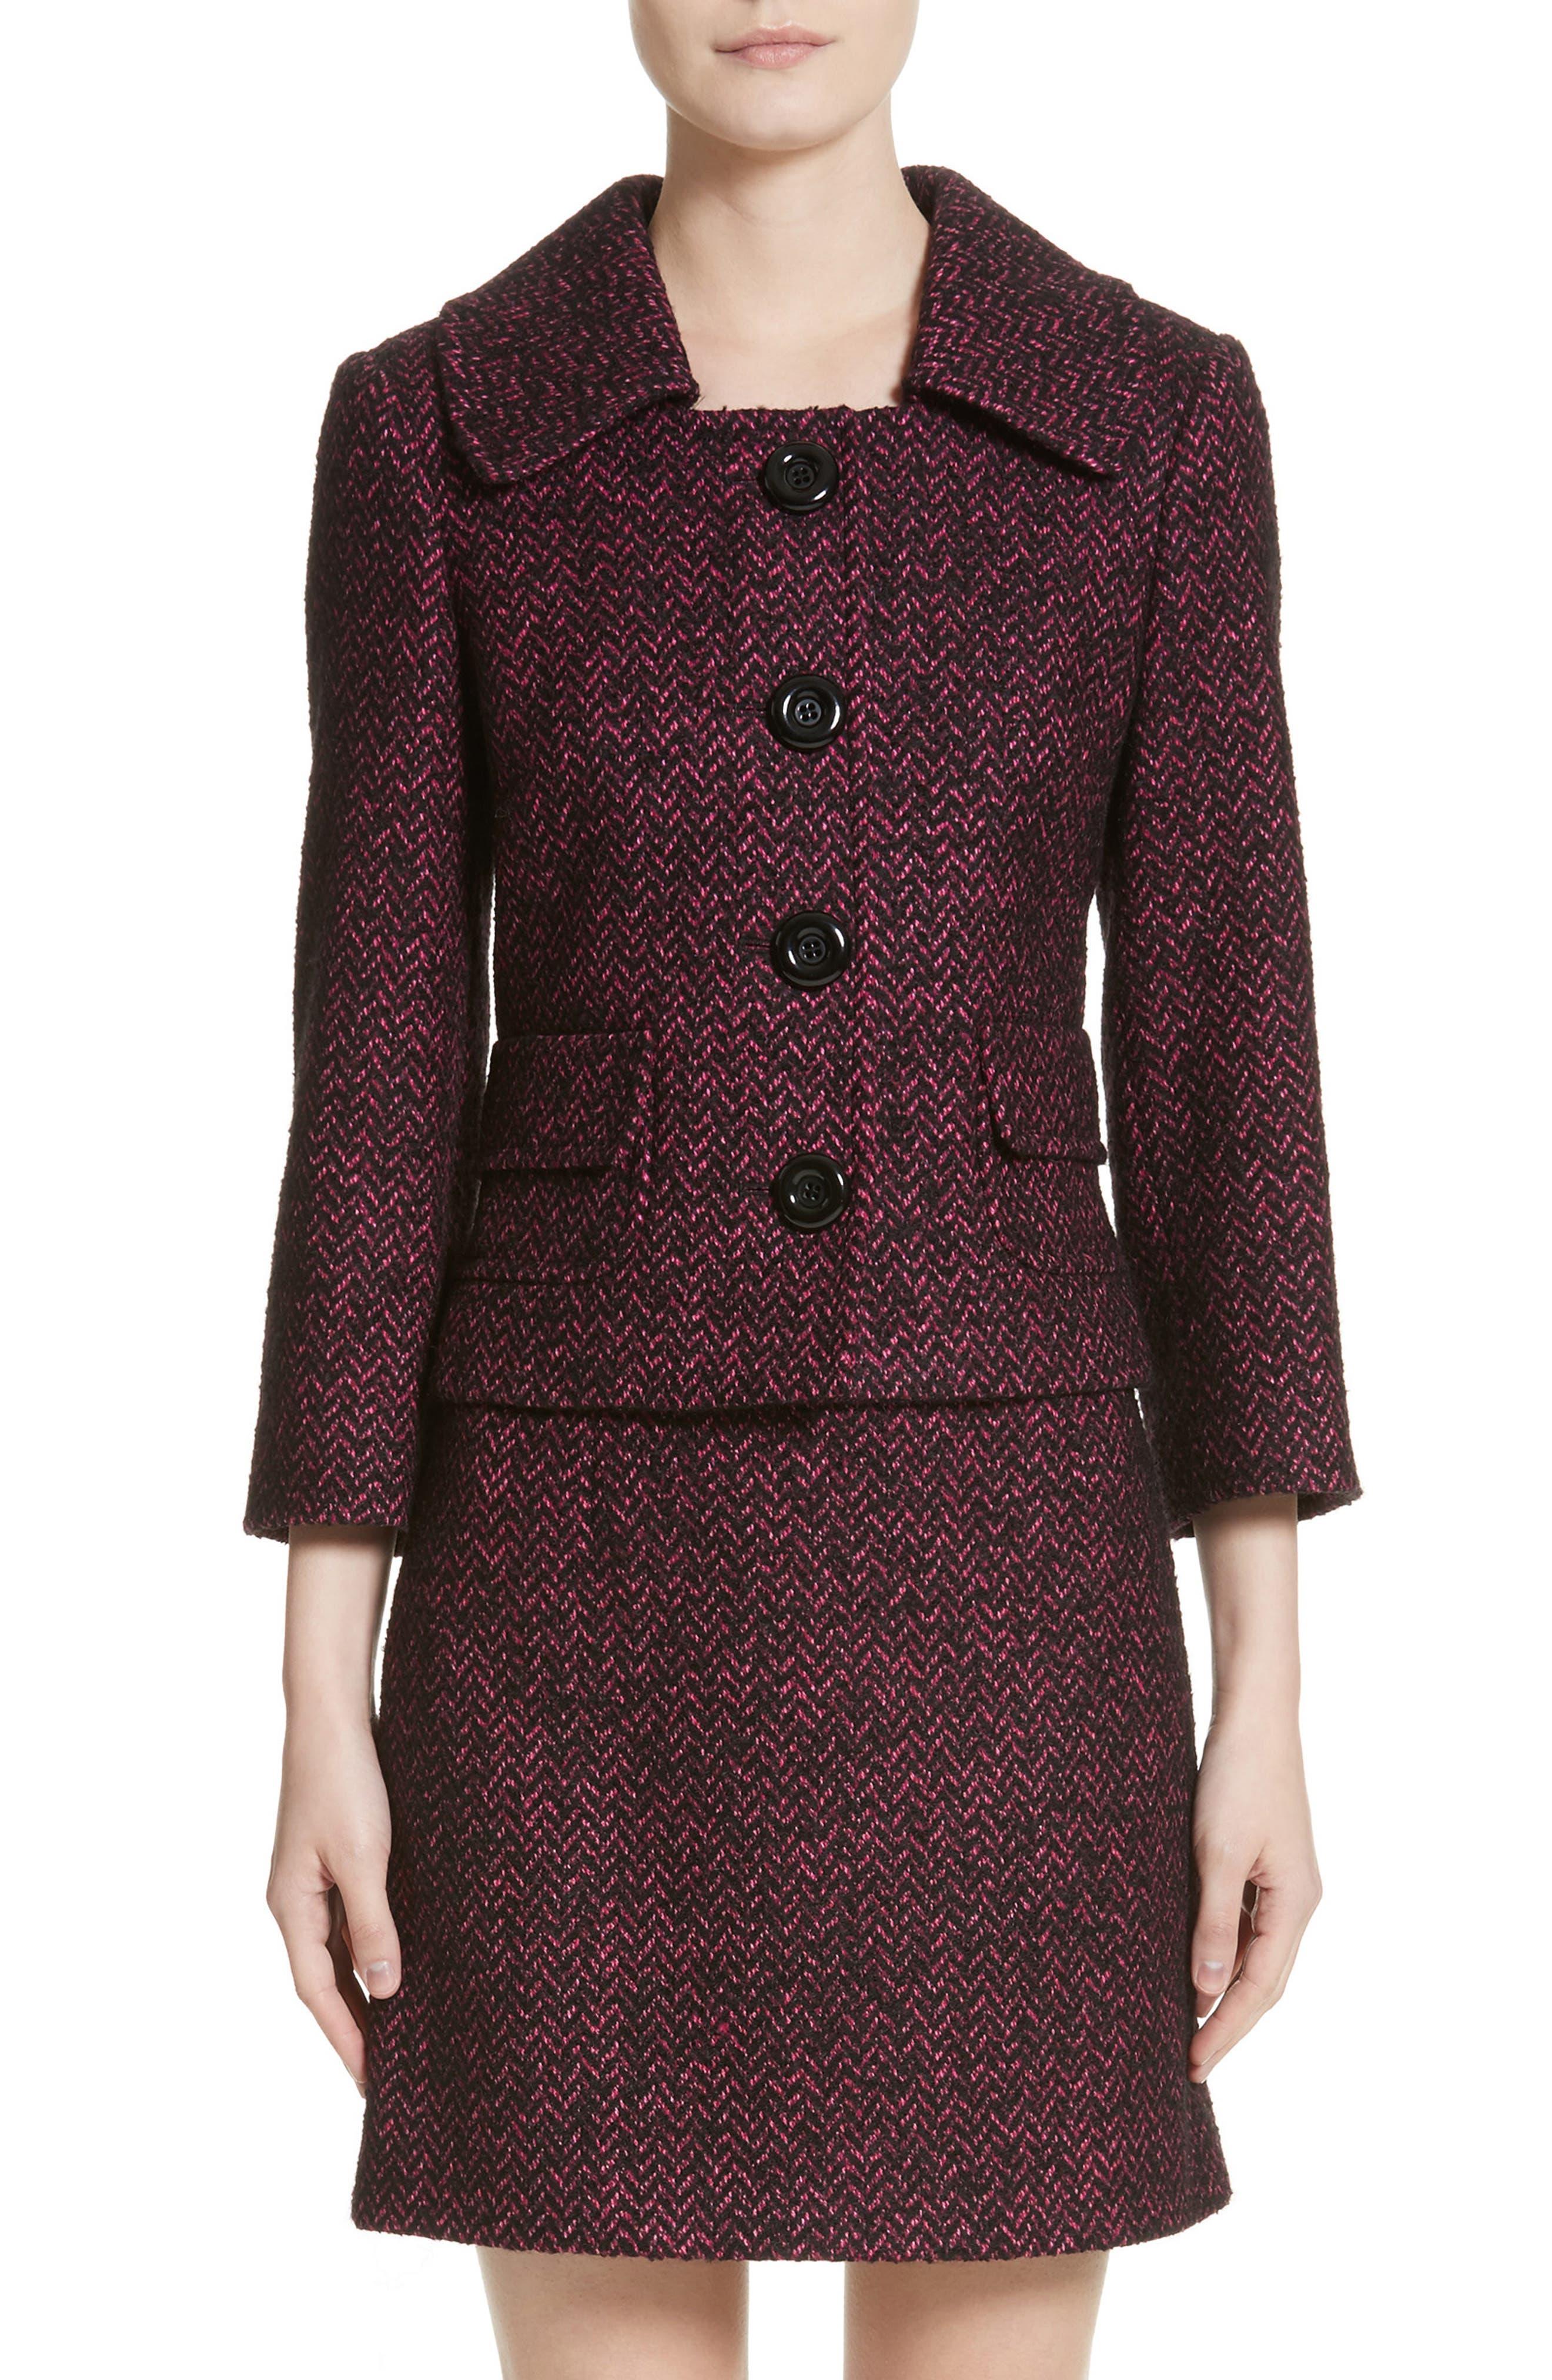 Herringbone Wool Blend Jacket,                         Main,                         color, Magnolia/ Black